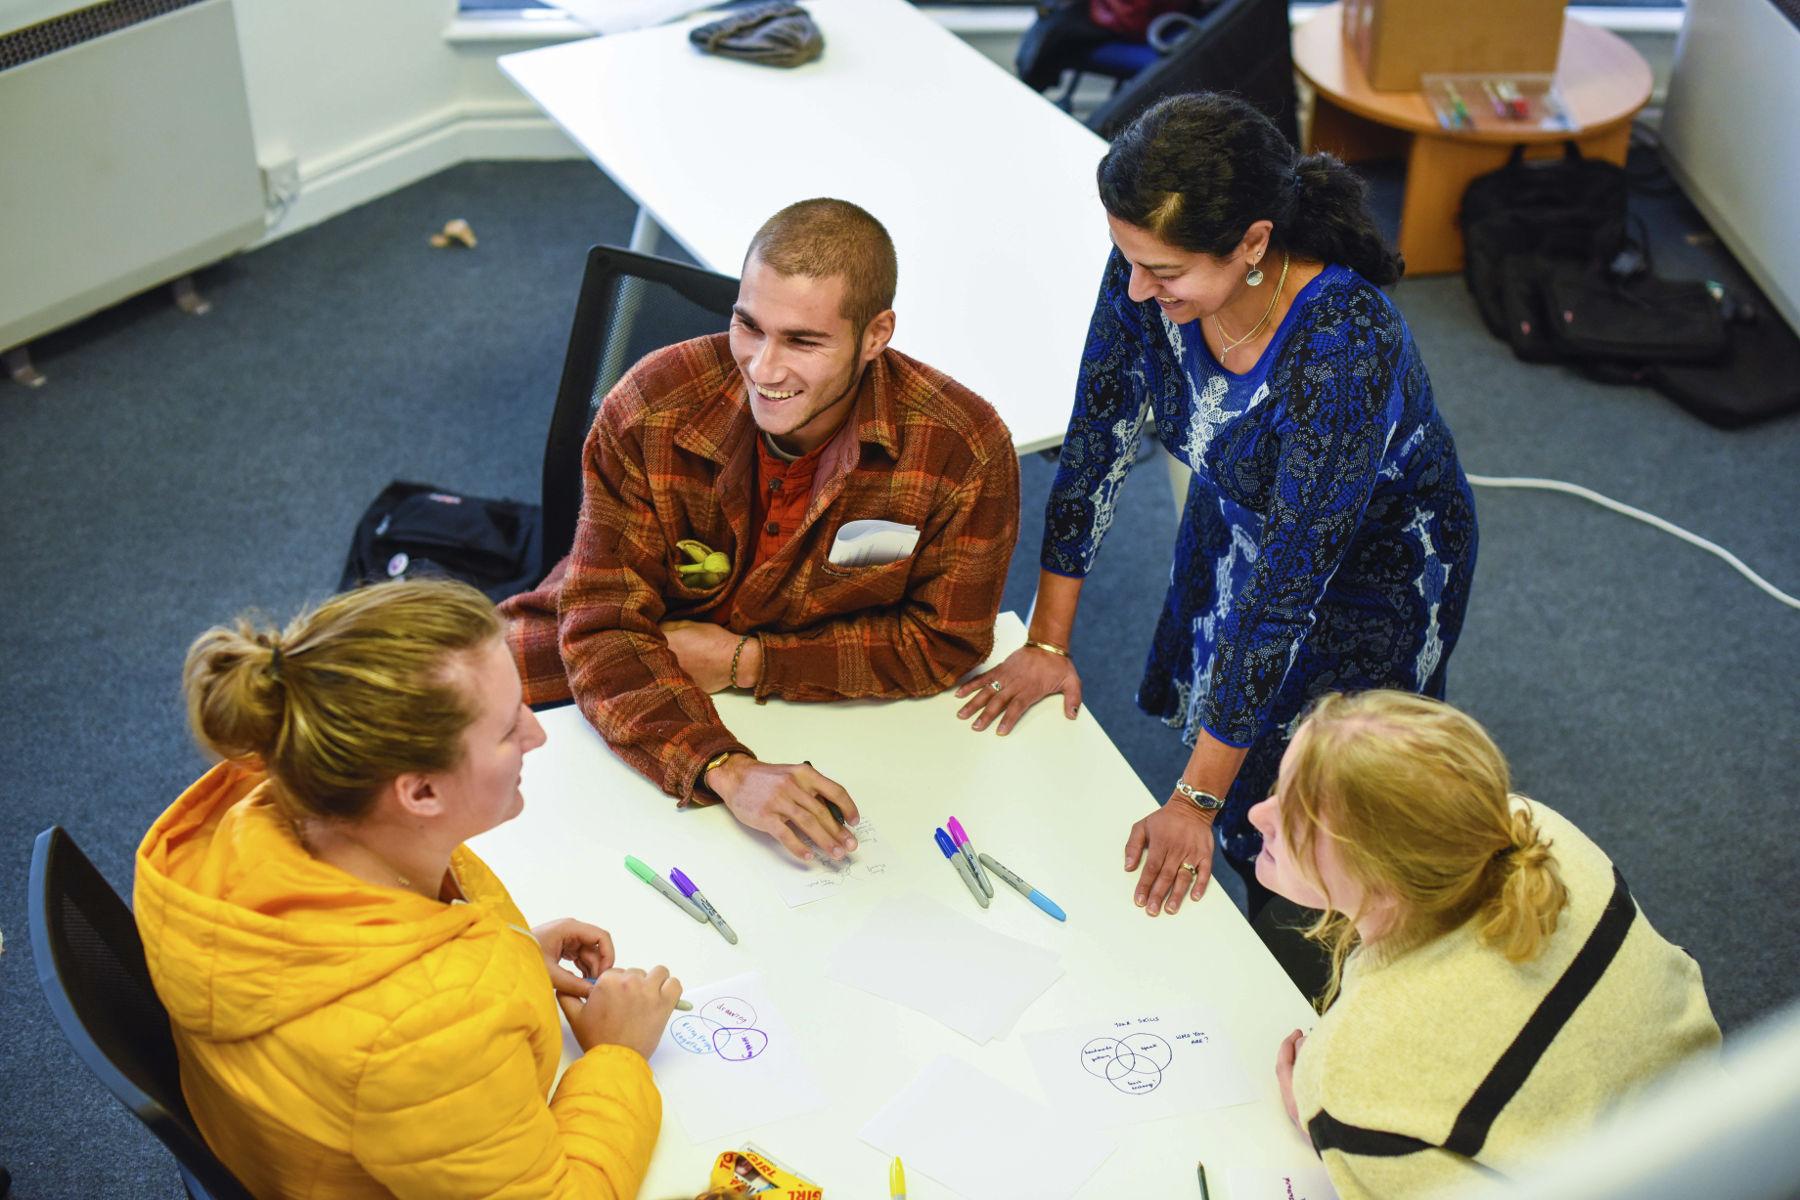 Atlantic Youth Creative Hubs